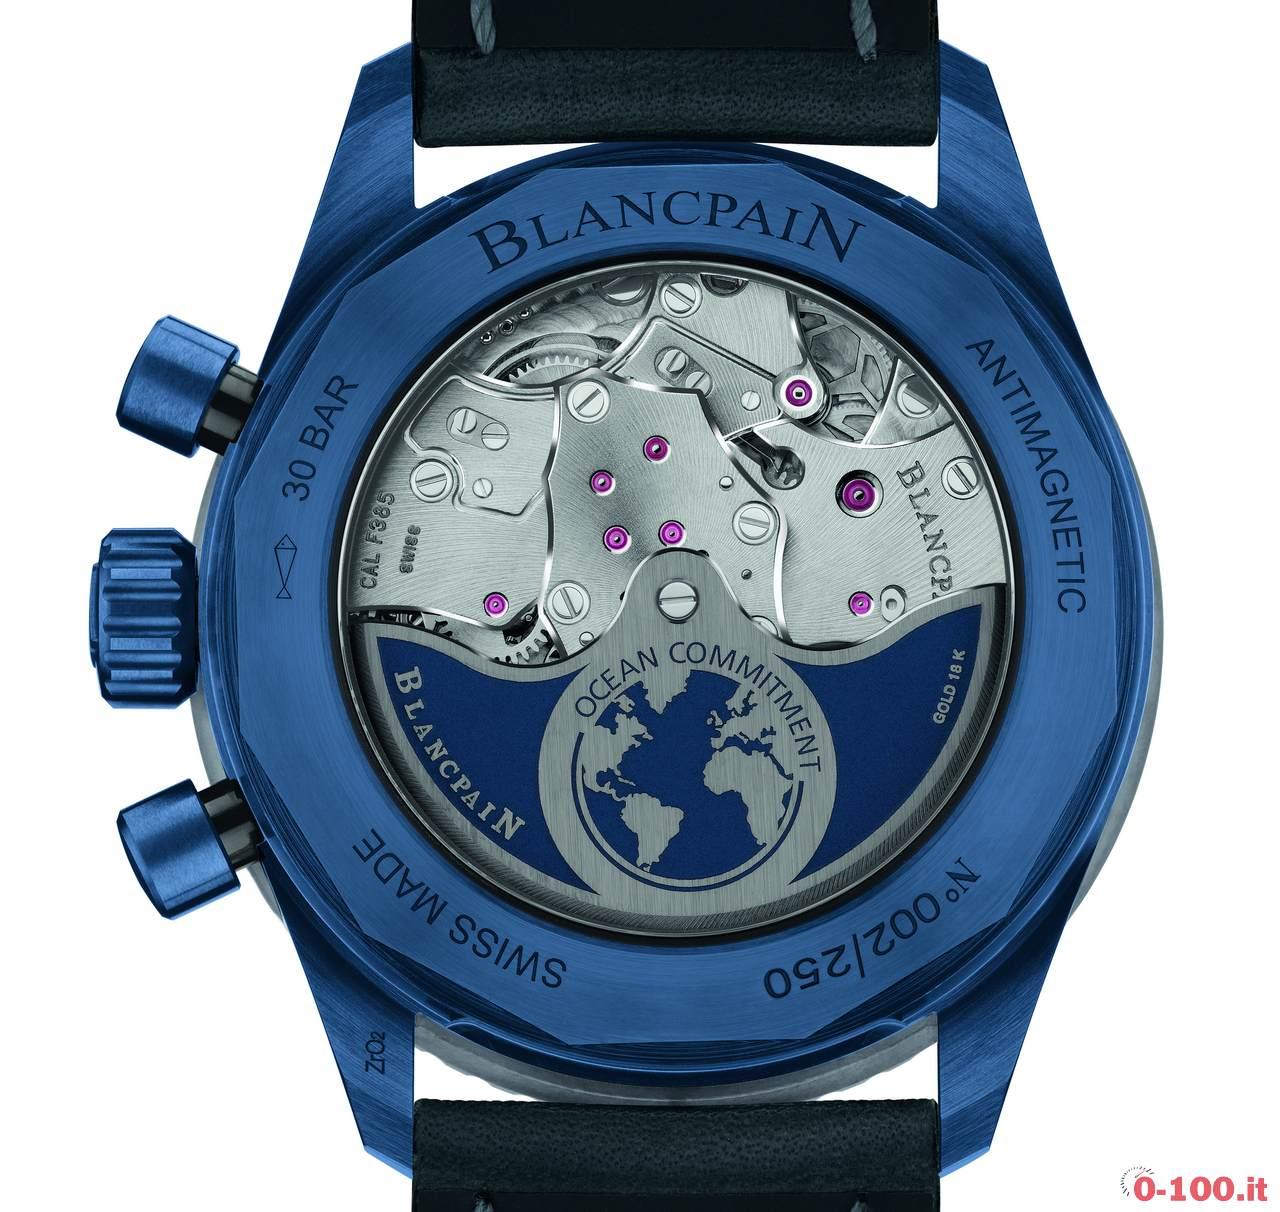 blancpain-bathyscaphe-chronographe-flyback-blancpain-ocean-commitment-ii-prezzo-price_0-1005